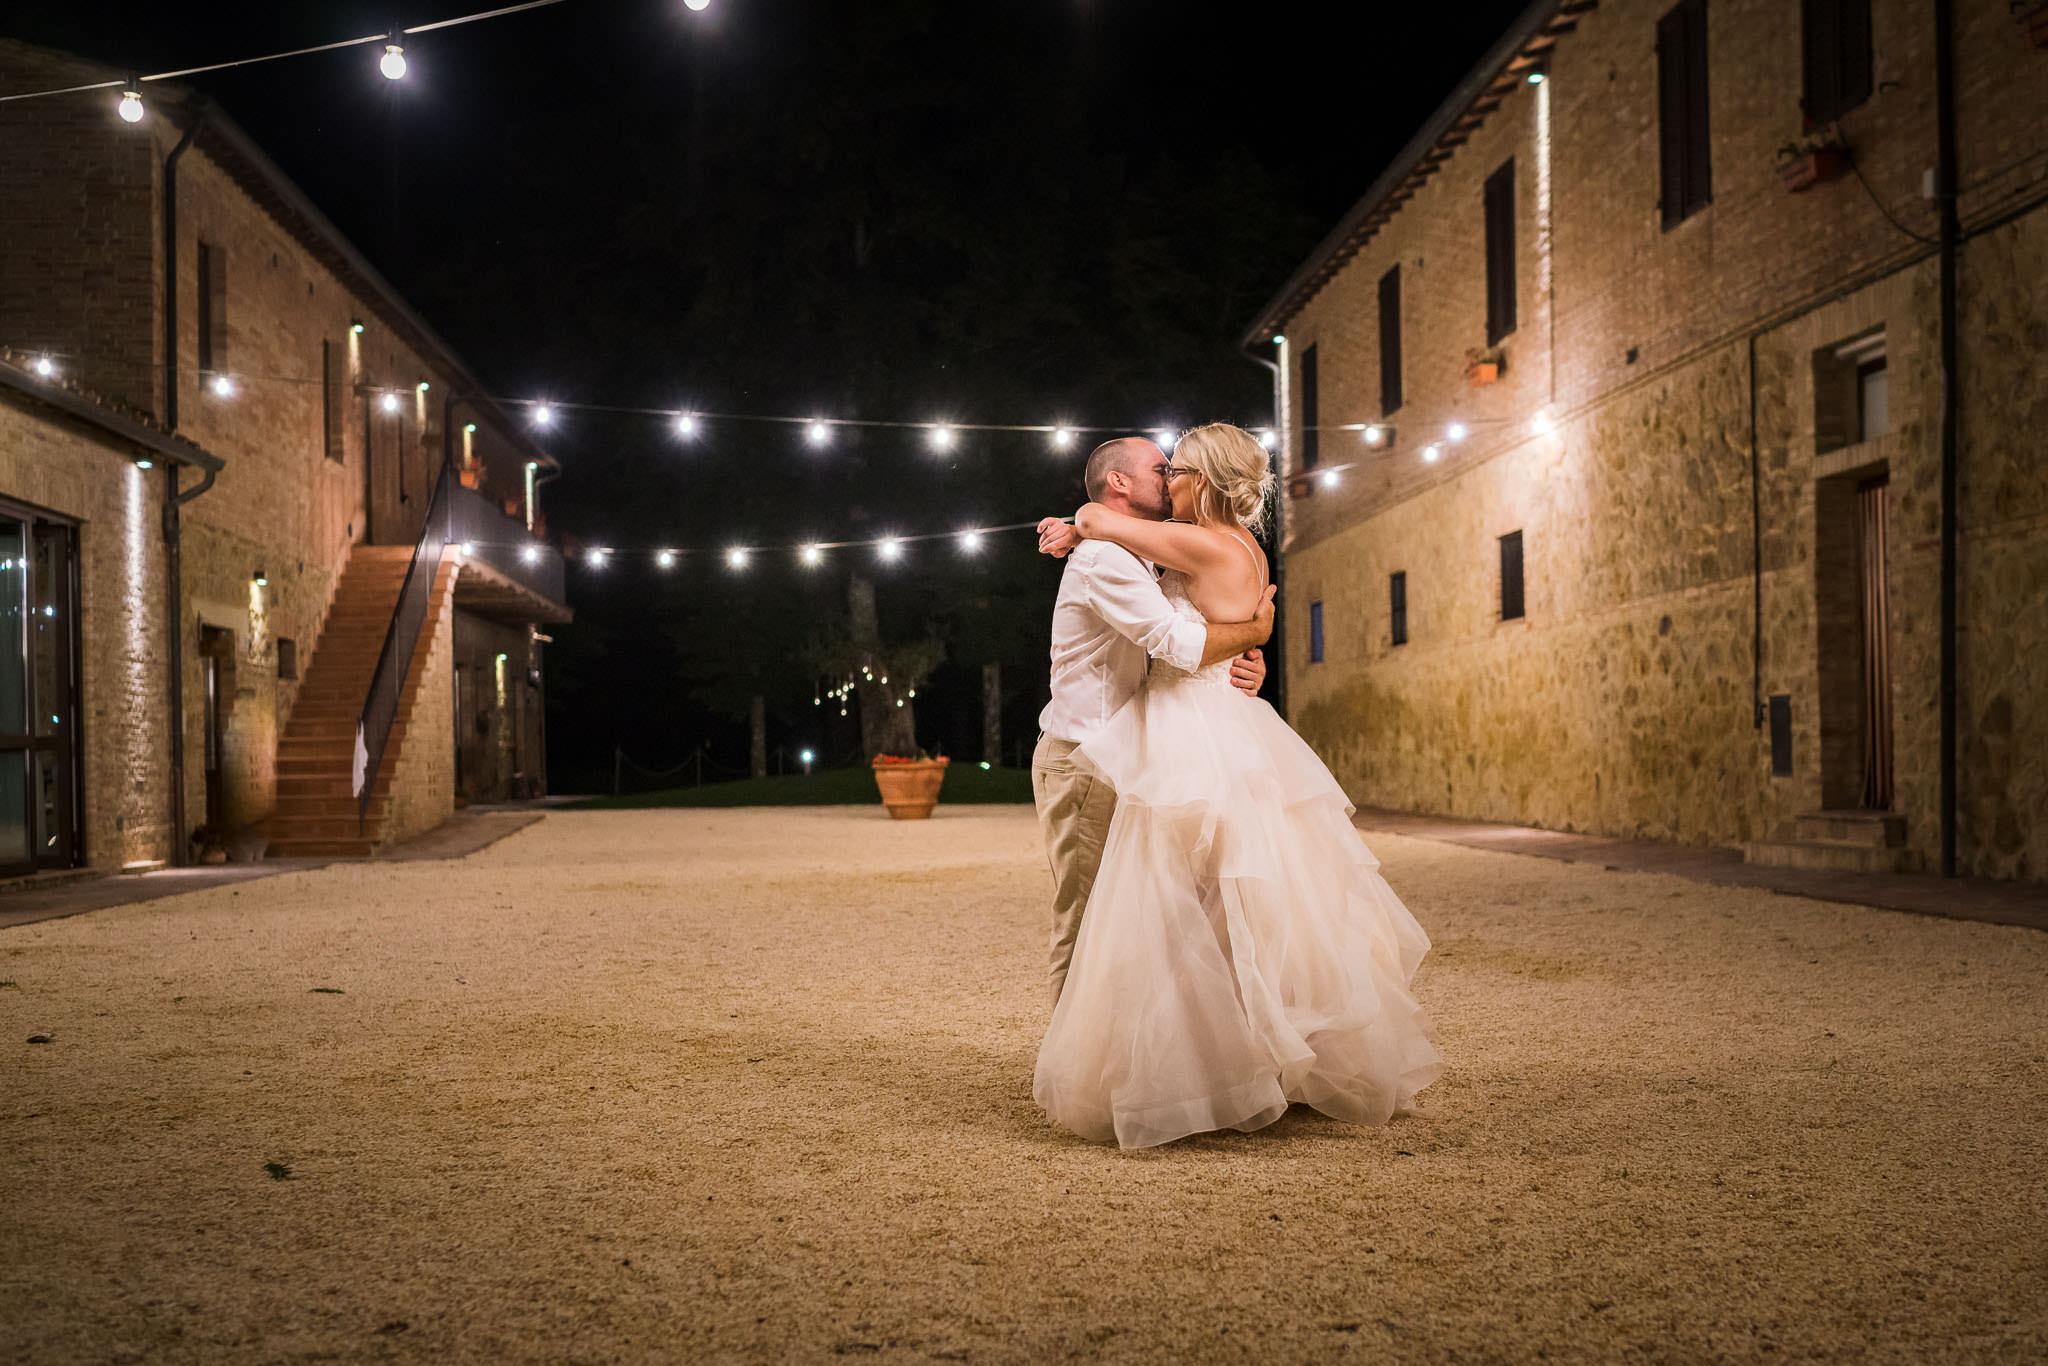 NC-2018-09-07_gemma-and-steve-wedding-0040.jpg